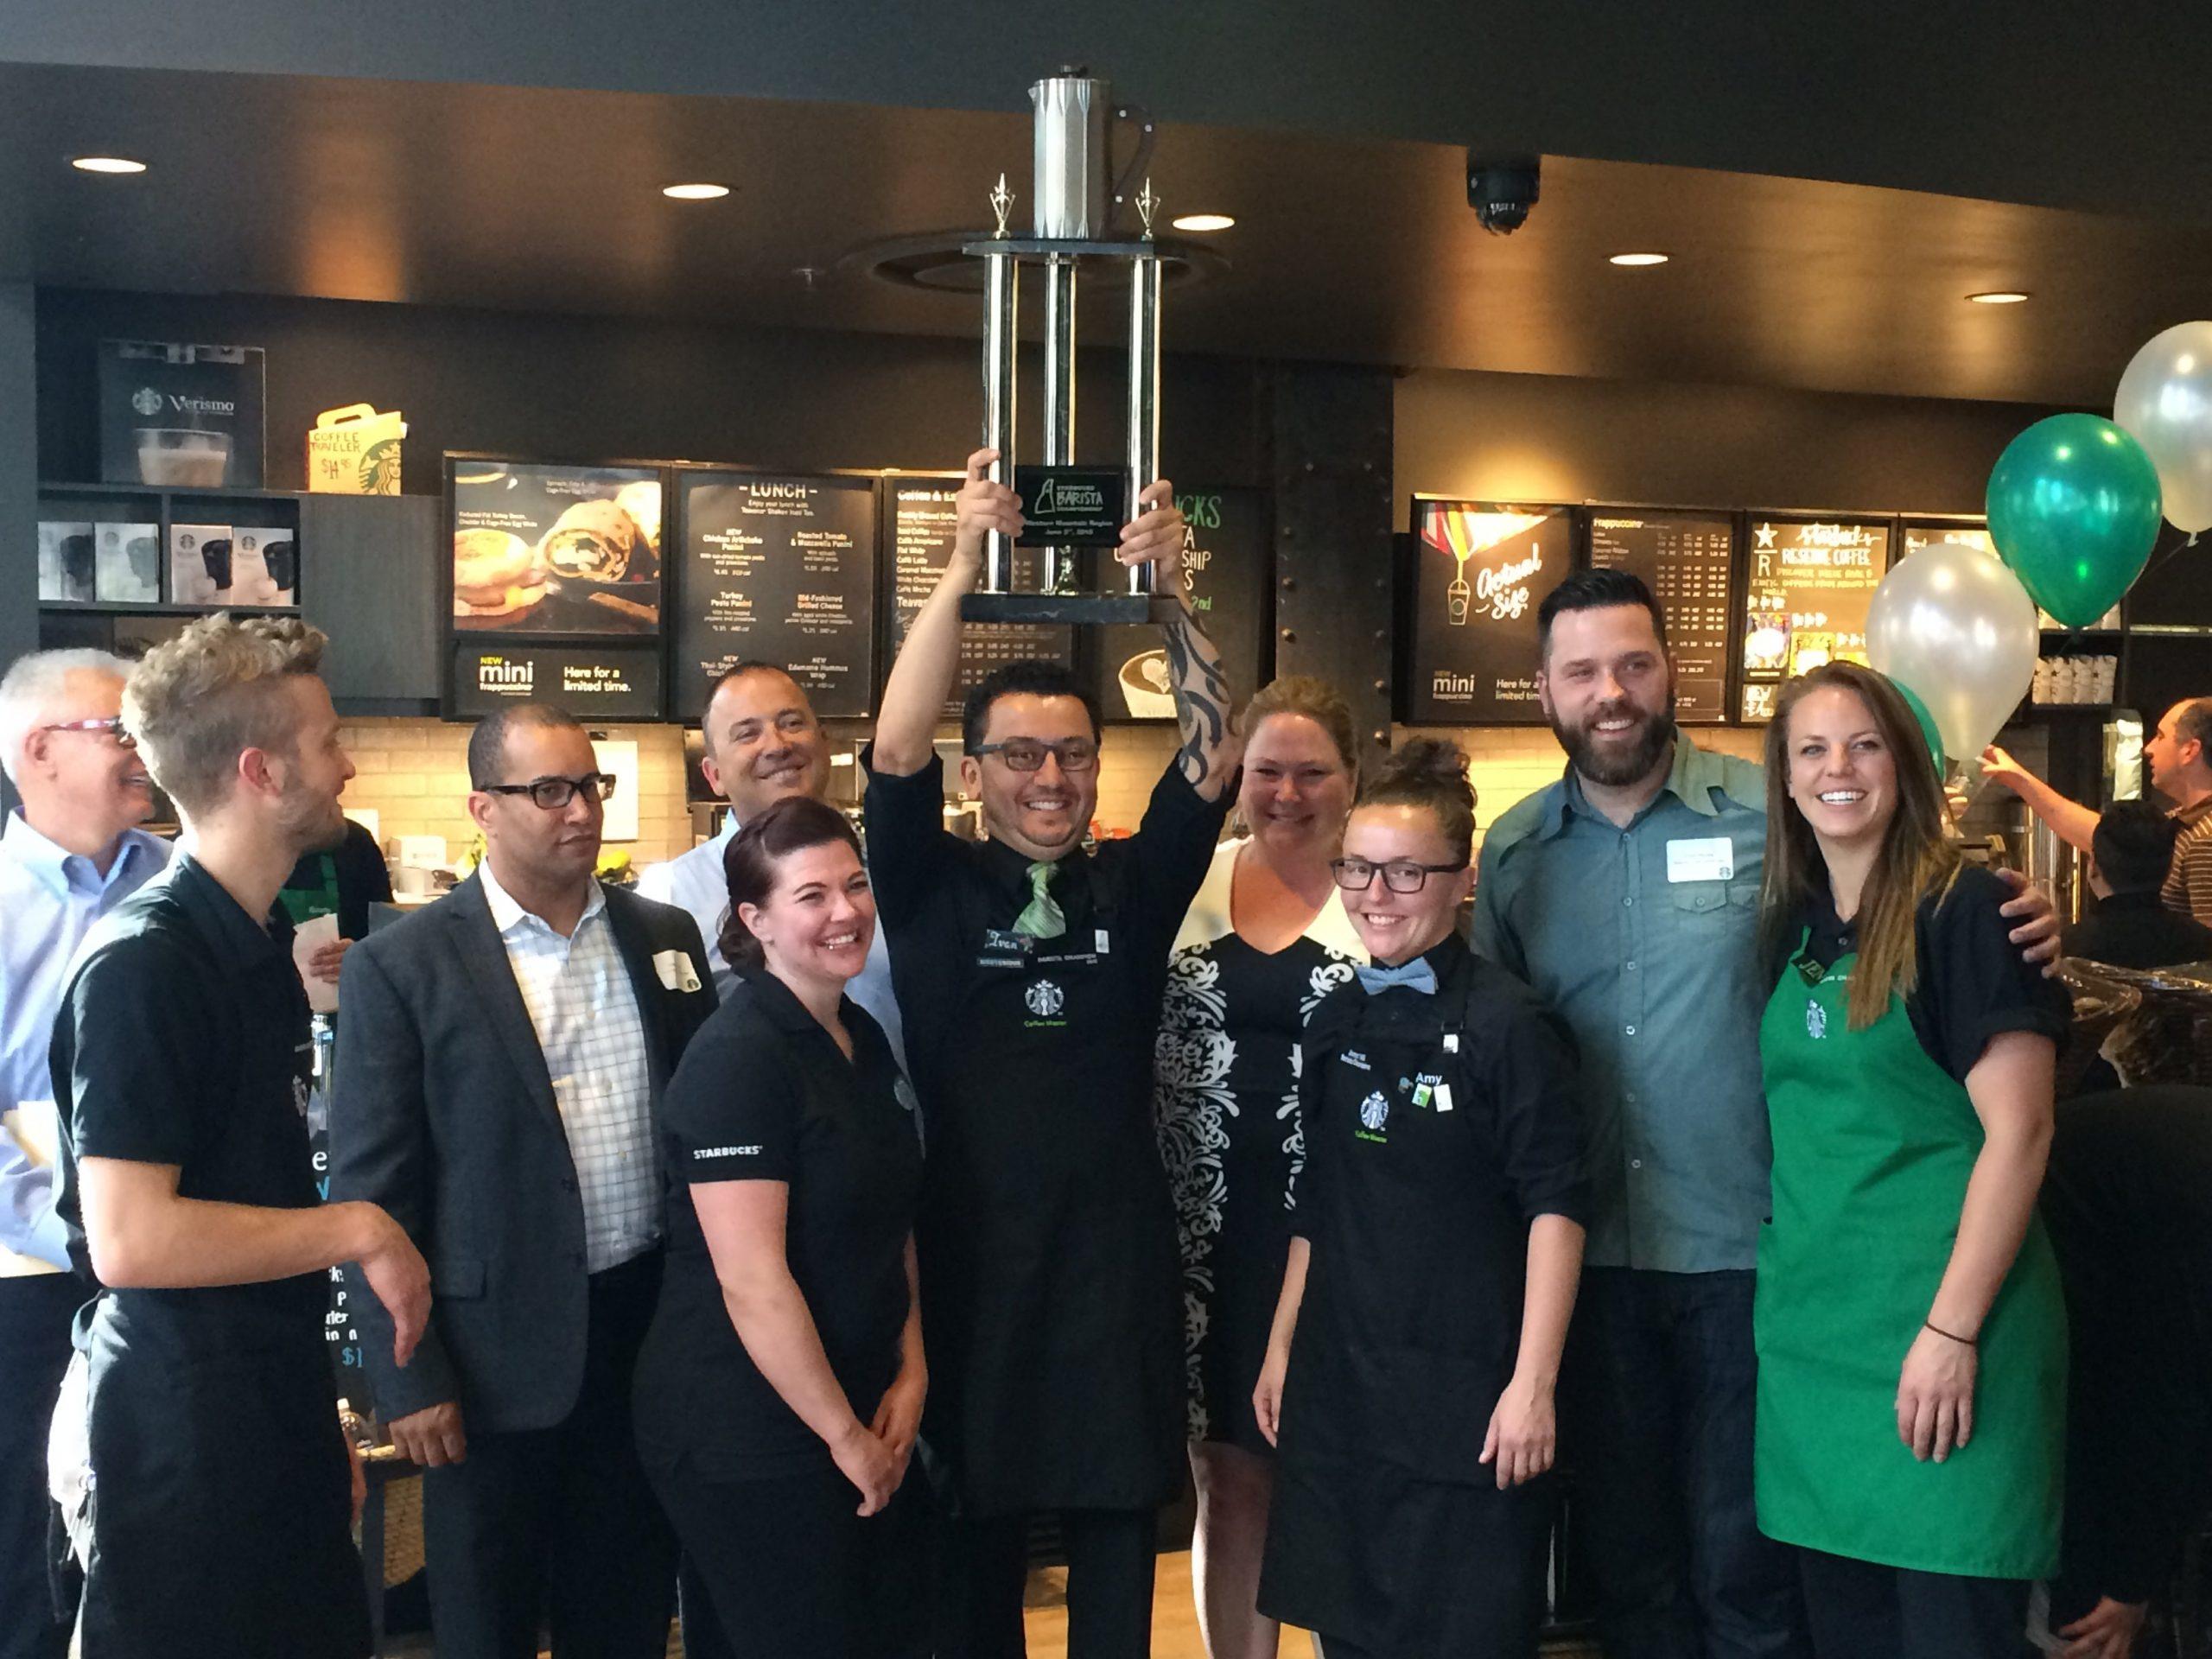 Starbucks Employees Will Start Wearing Masks @themotleyfool #stocks $sbux photo